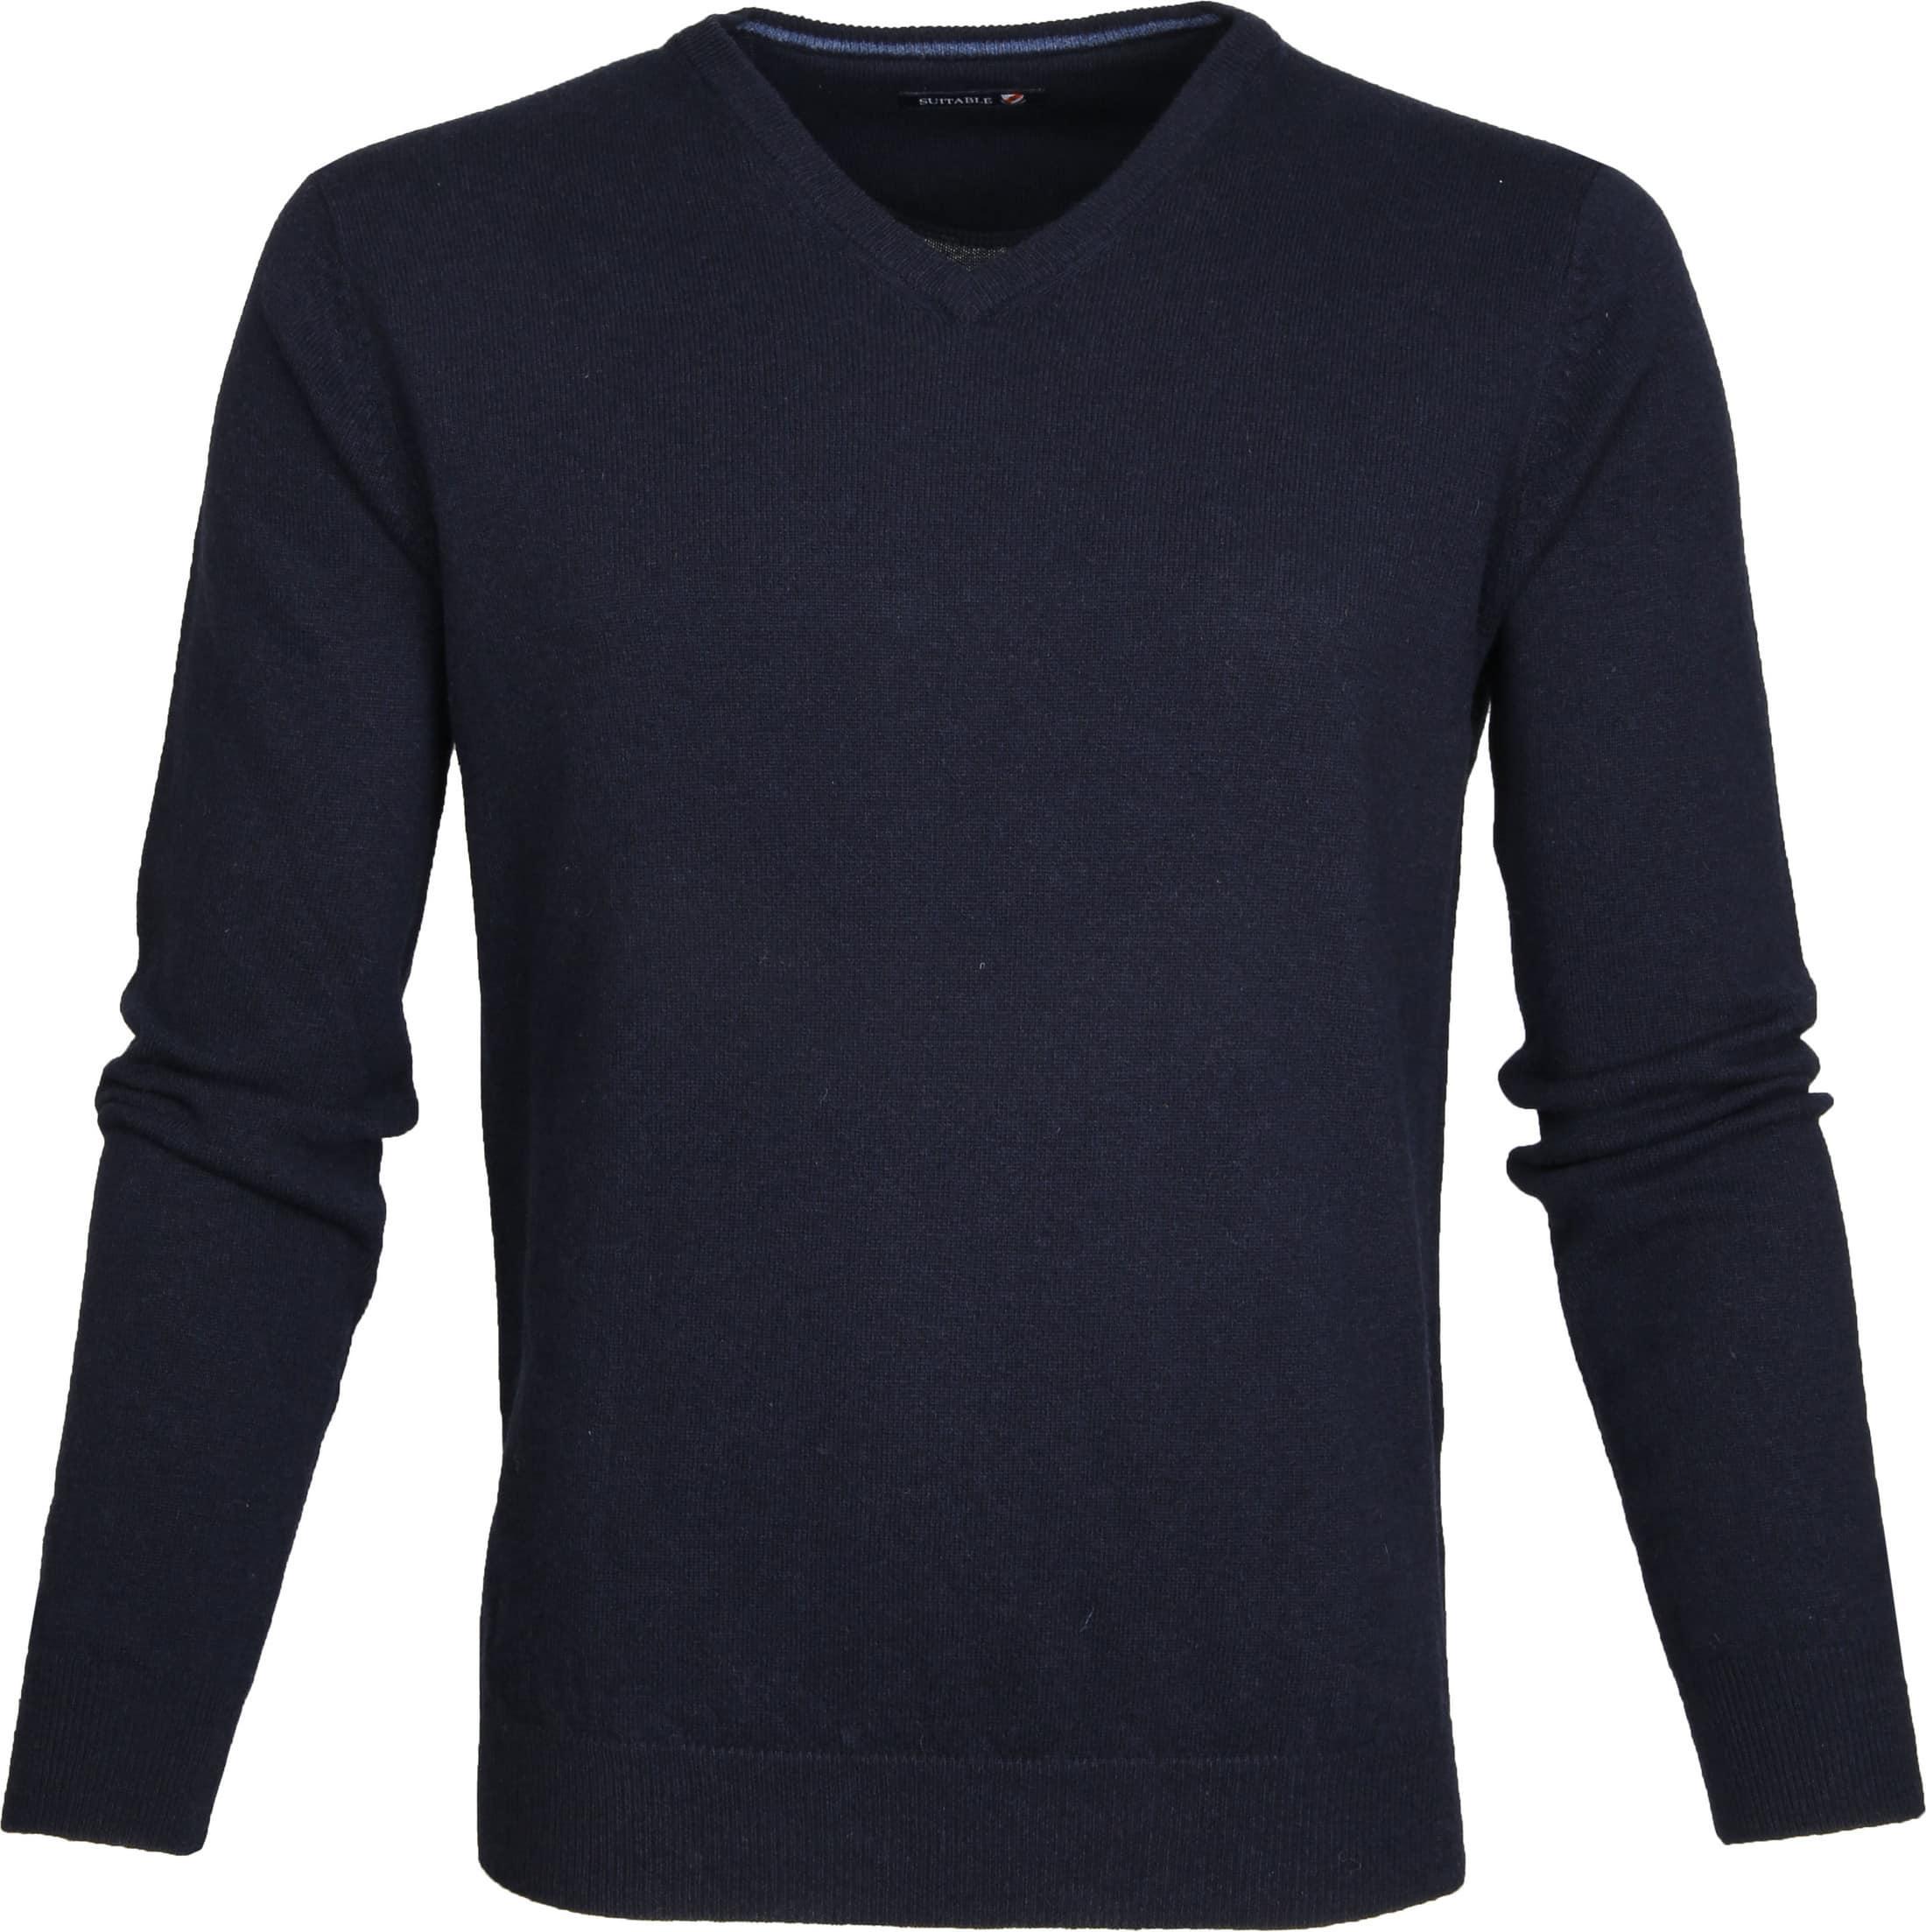 Suitable Pullover Lammwolle V-Ausschnitt Dunkelblau foto 0